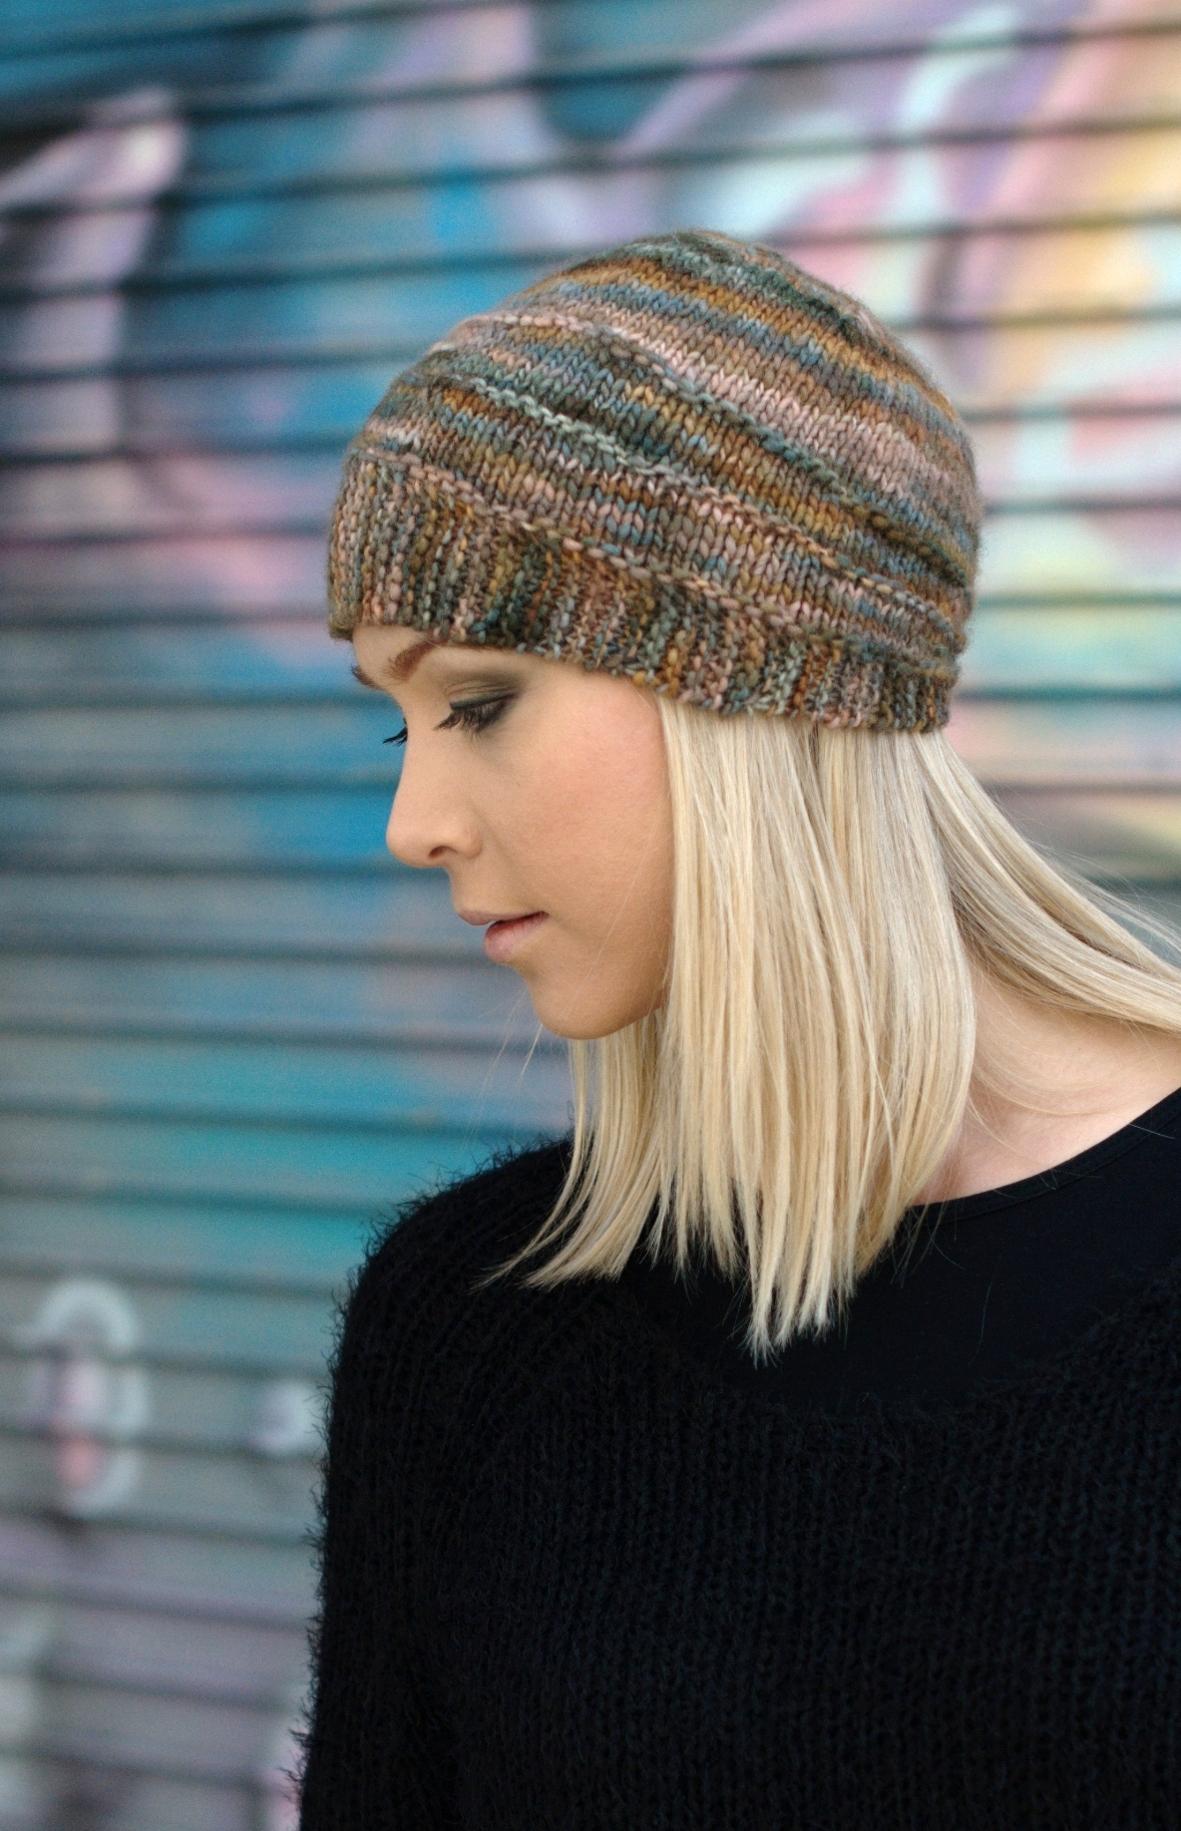 Quoin cloche Hat knitting pattern